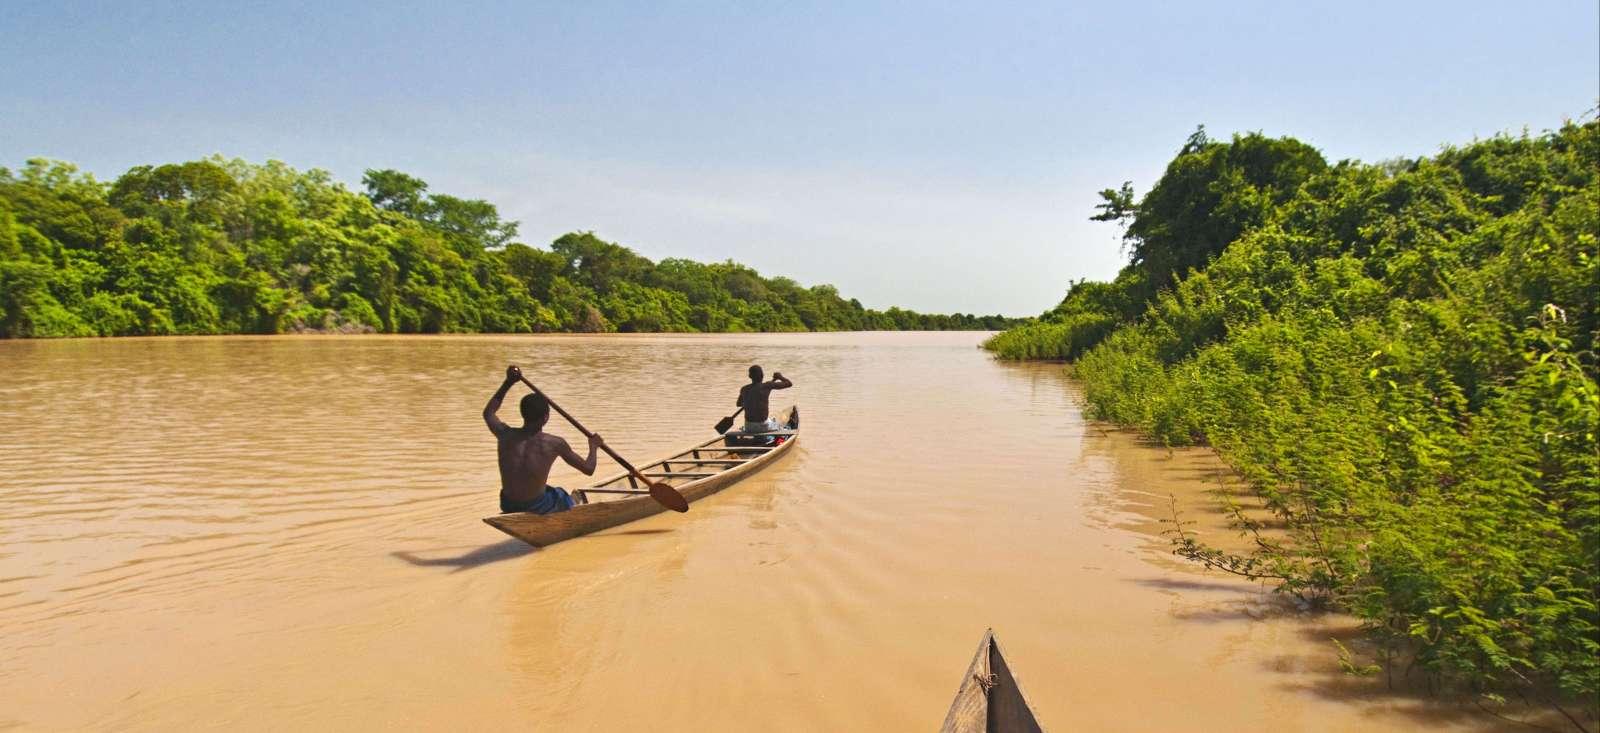 Voyage à pied : Best of Ghana